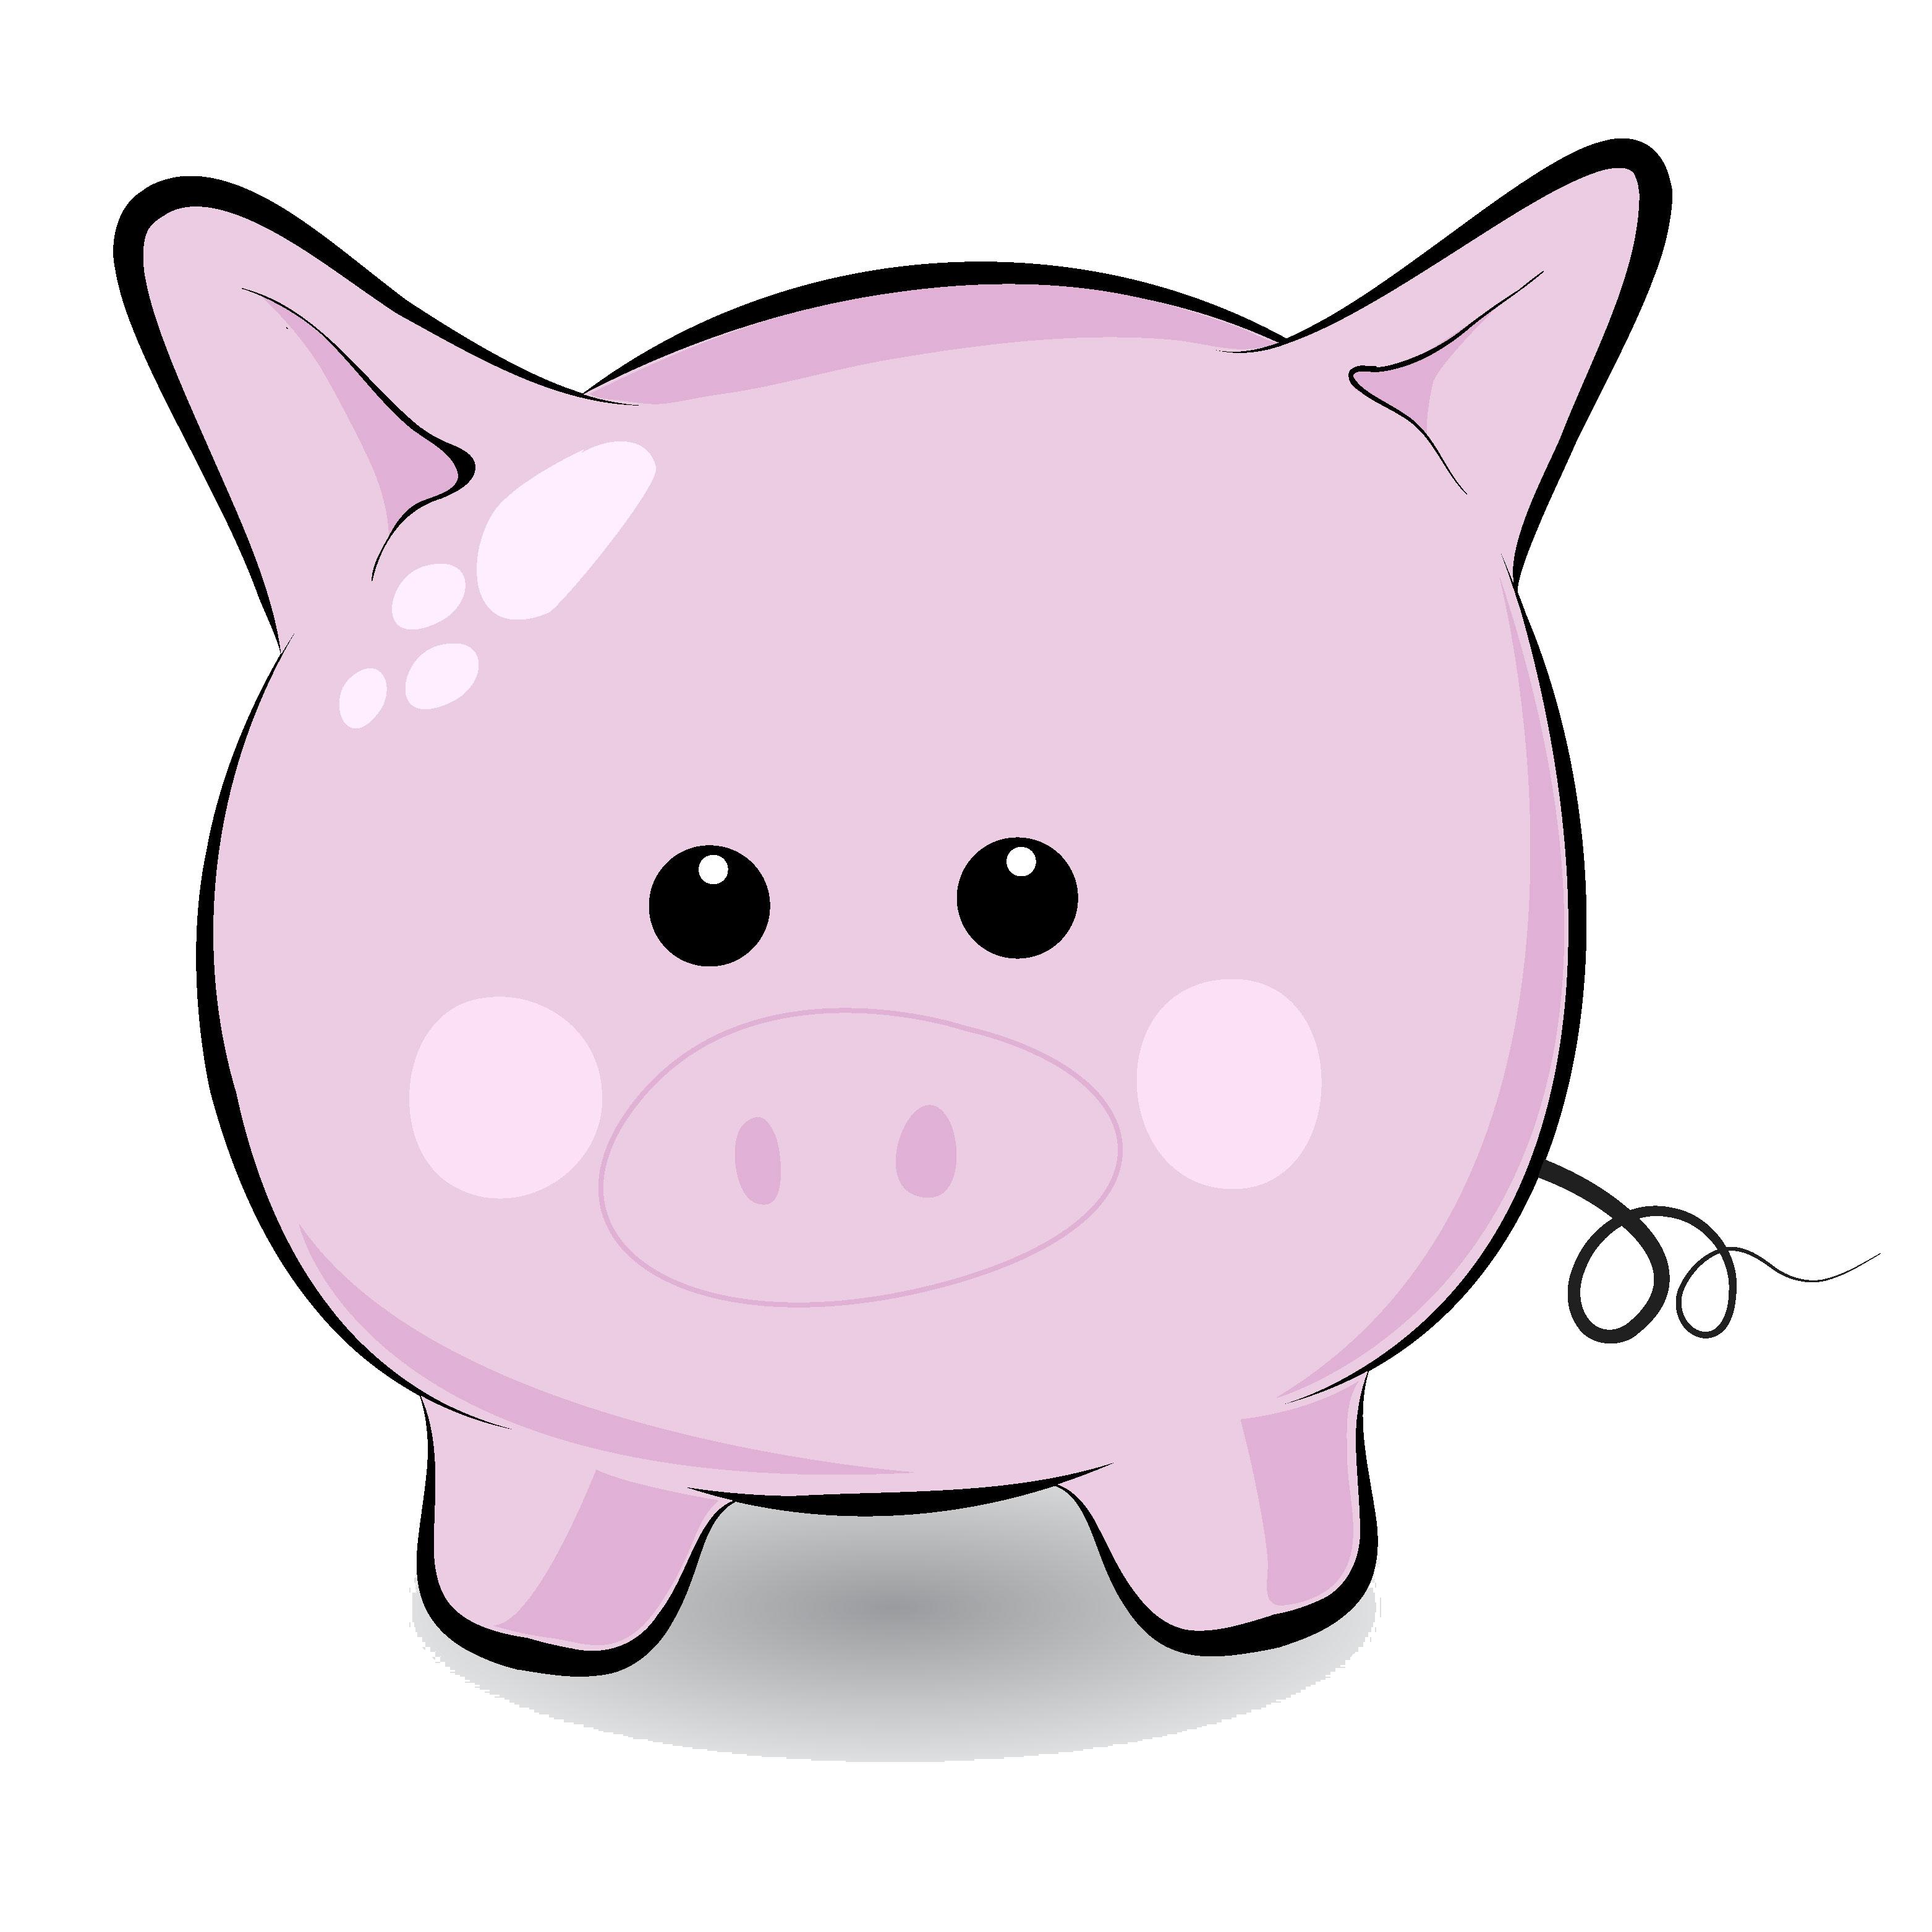 Pig Clipart-Pig Clipart-14